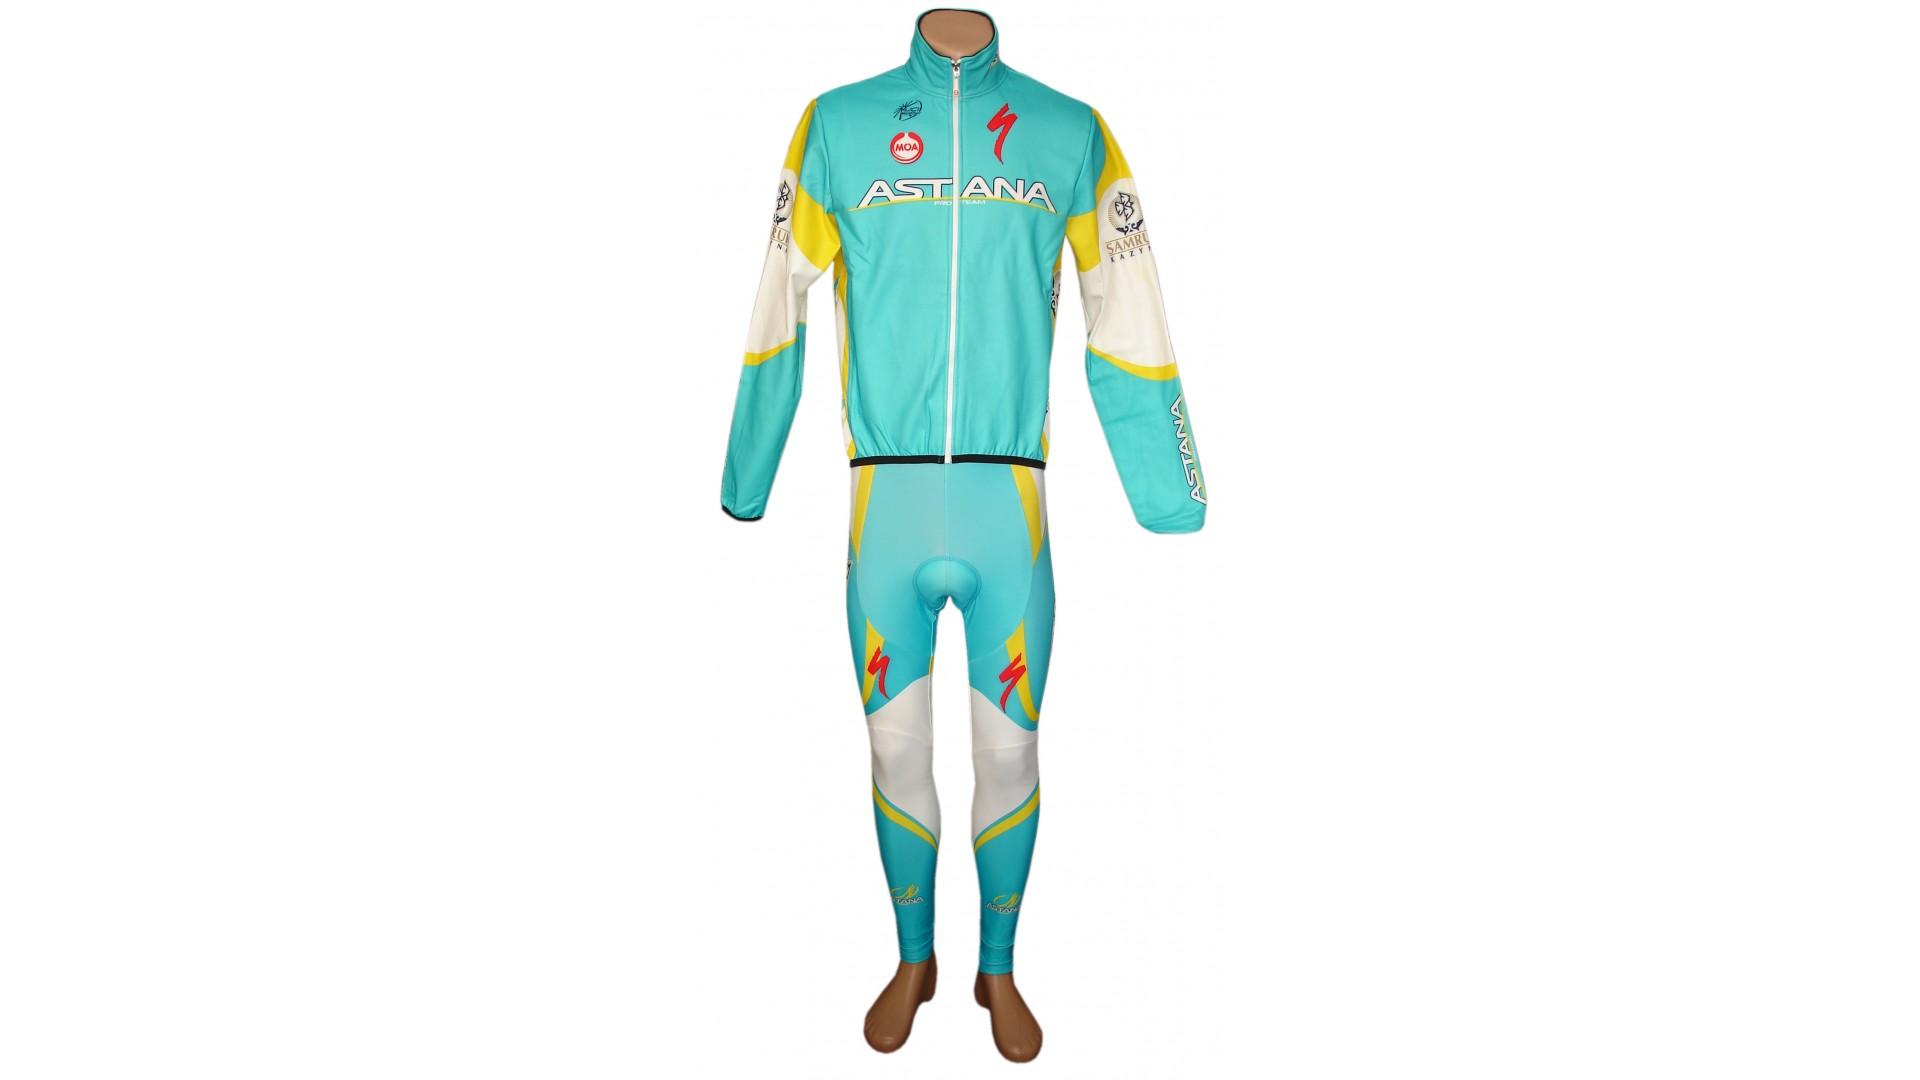 Велорейтузы Nalini Astana общий вид спереди